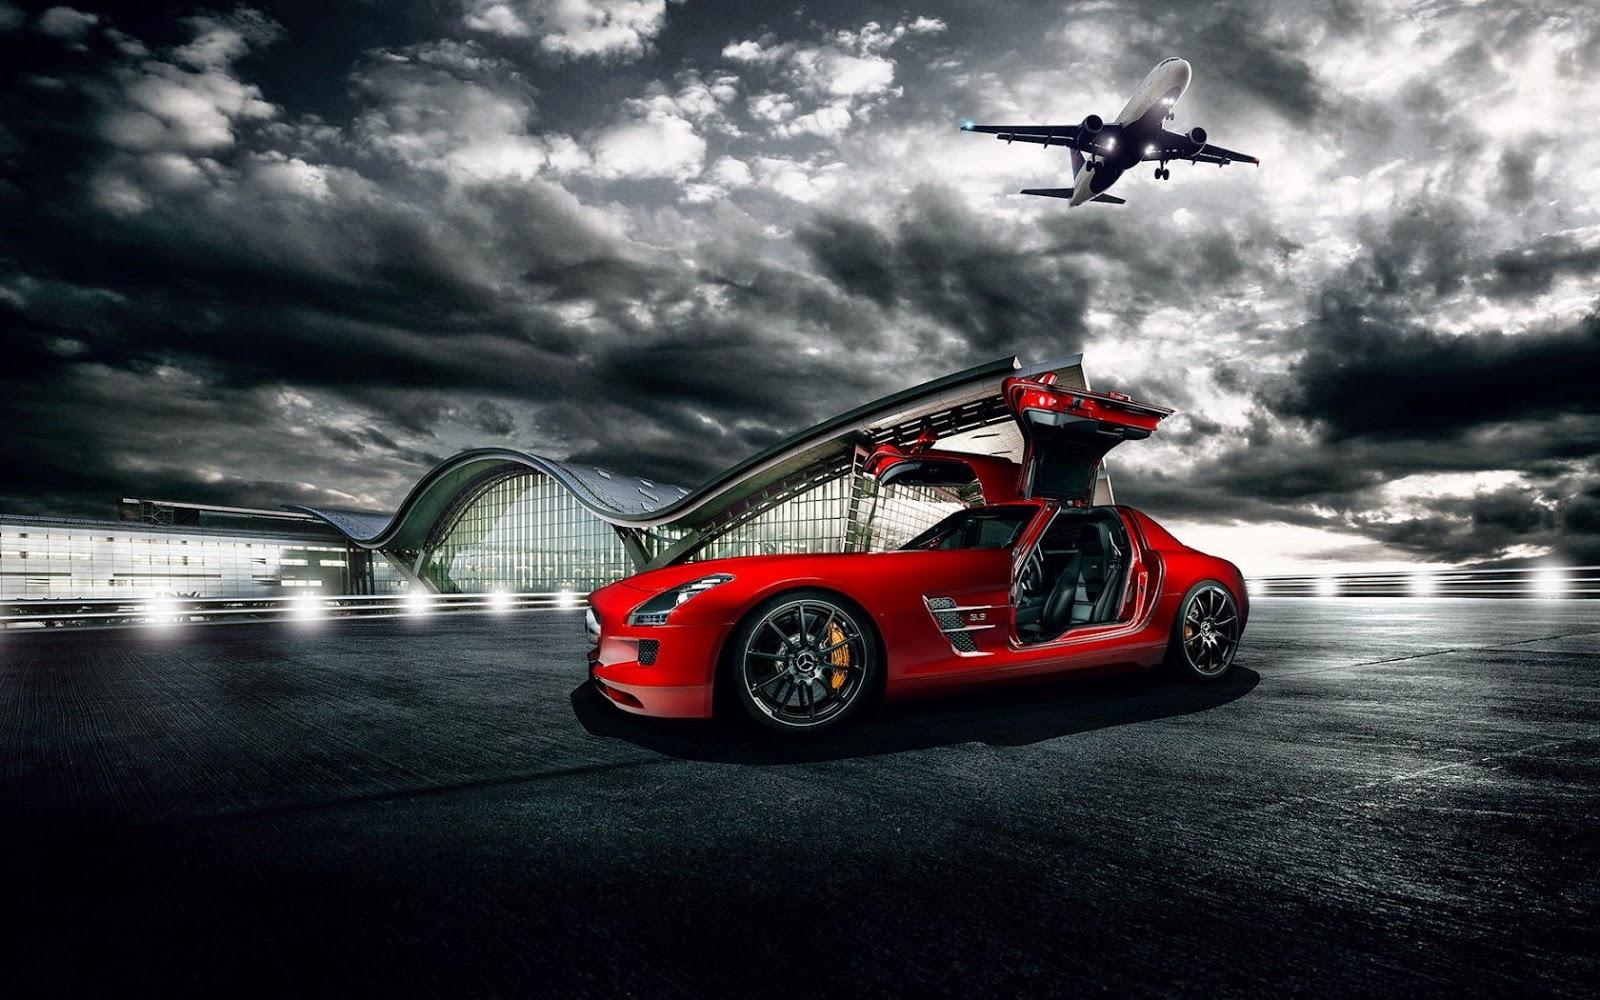 wallpaper Mobil Sport Mewah Mercedez